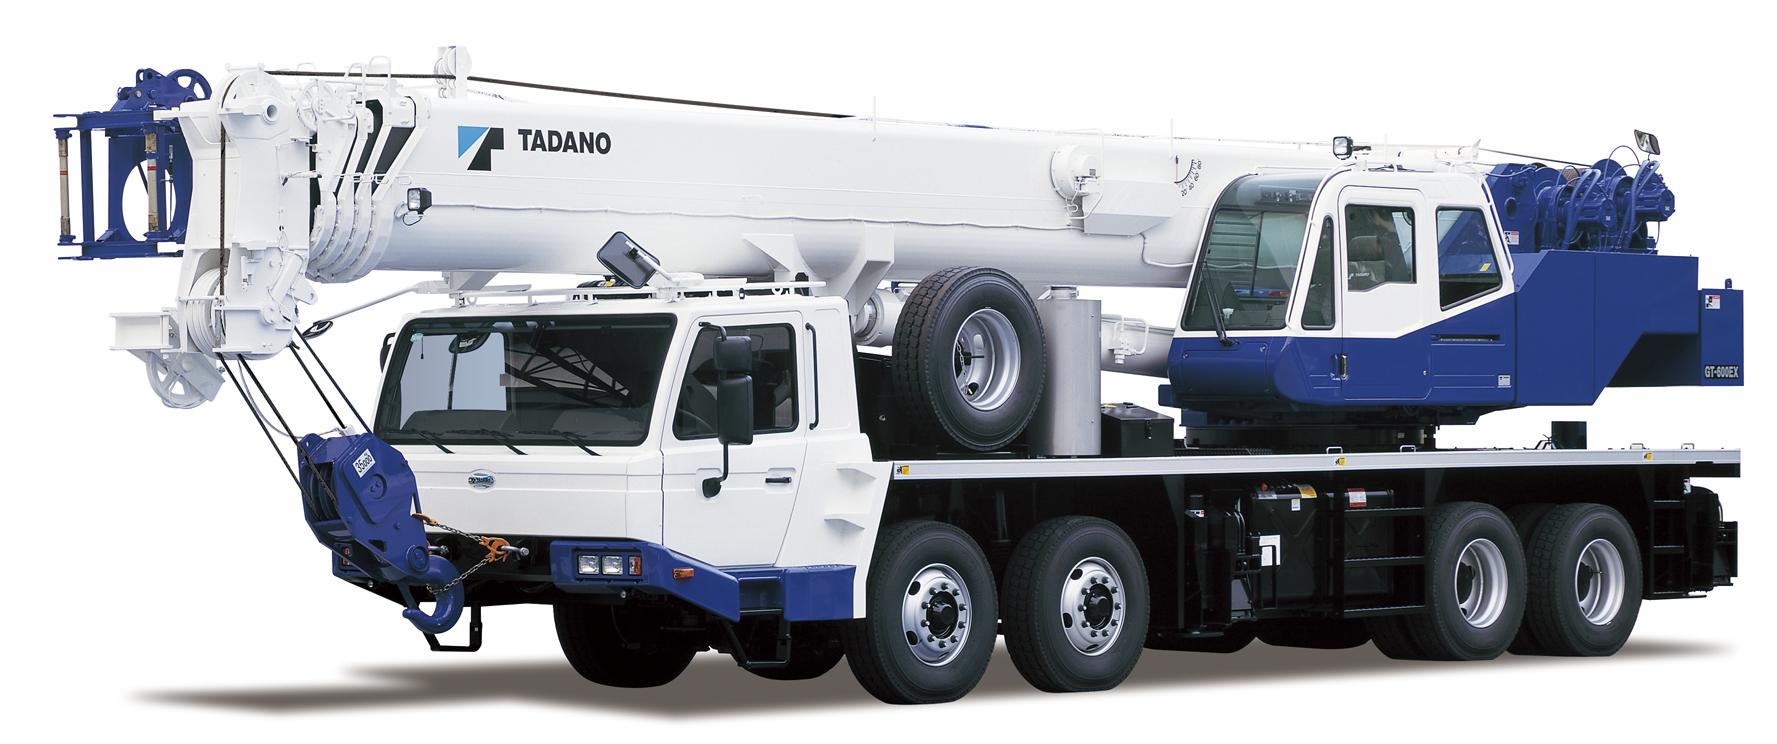 Tadano Truck Cranes